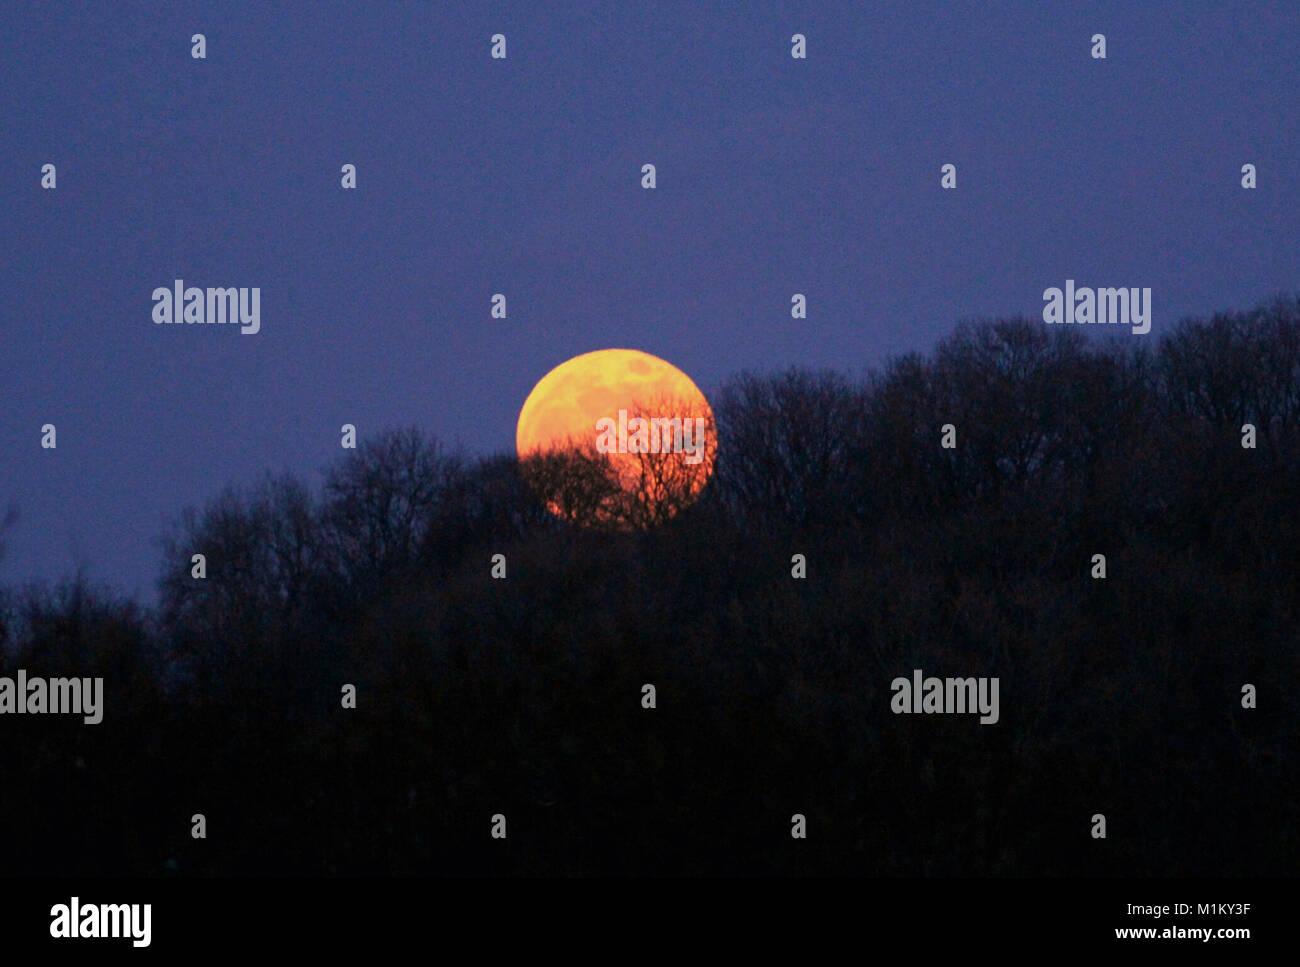 Blue moon super full moon rises over tree tops near Wells, Somerset, UK on 31st January 2018. - Stock Image